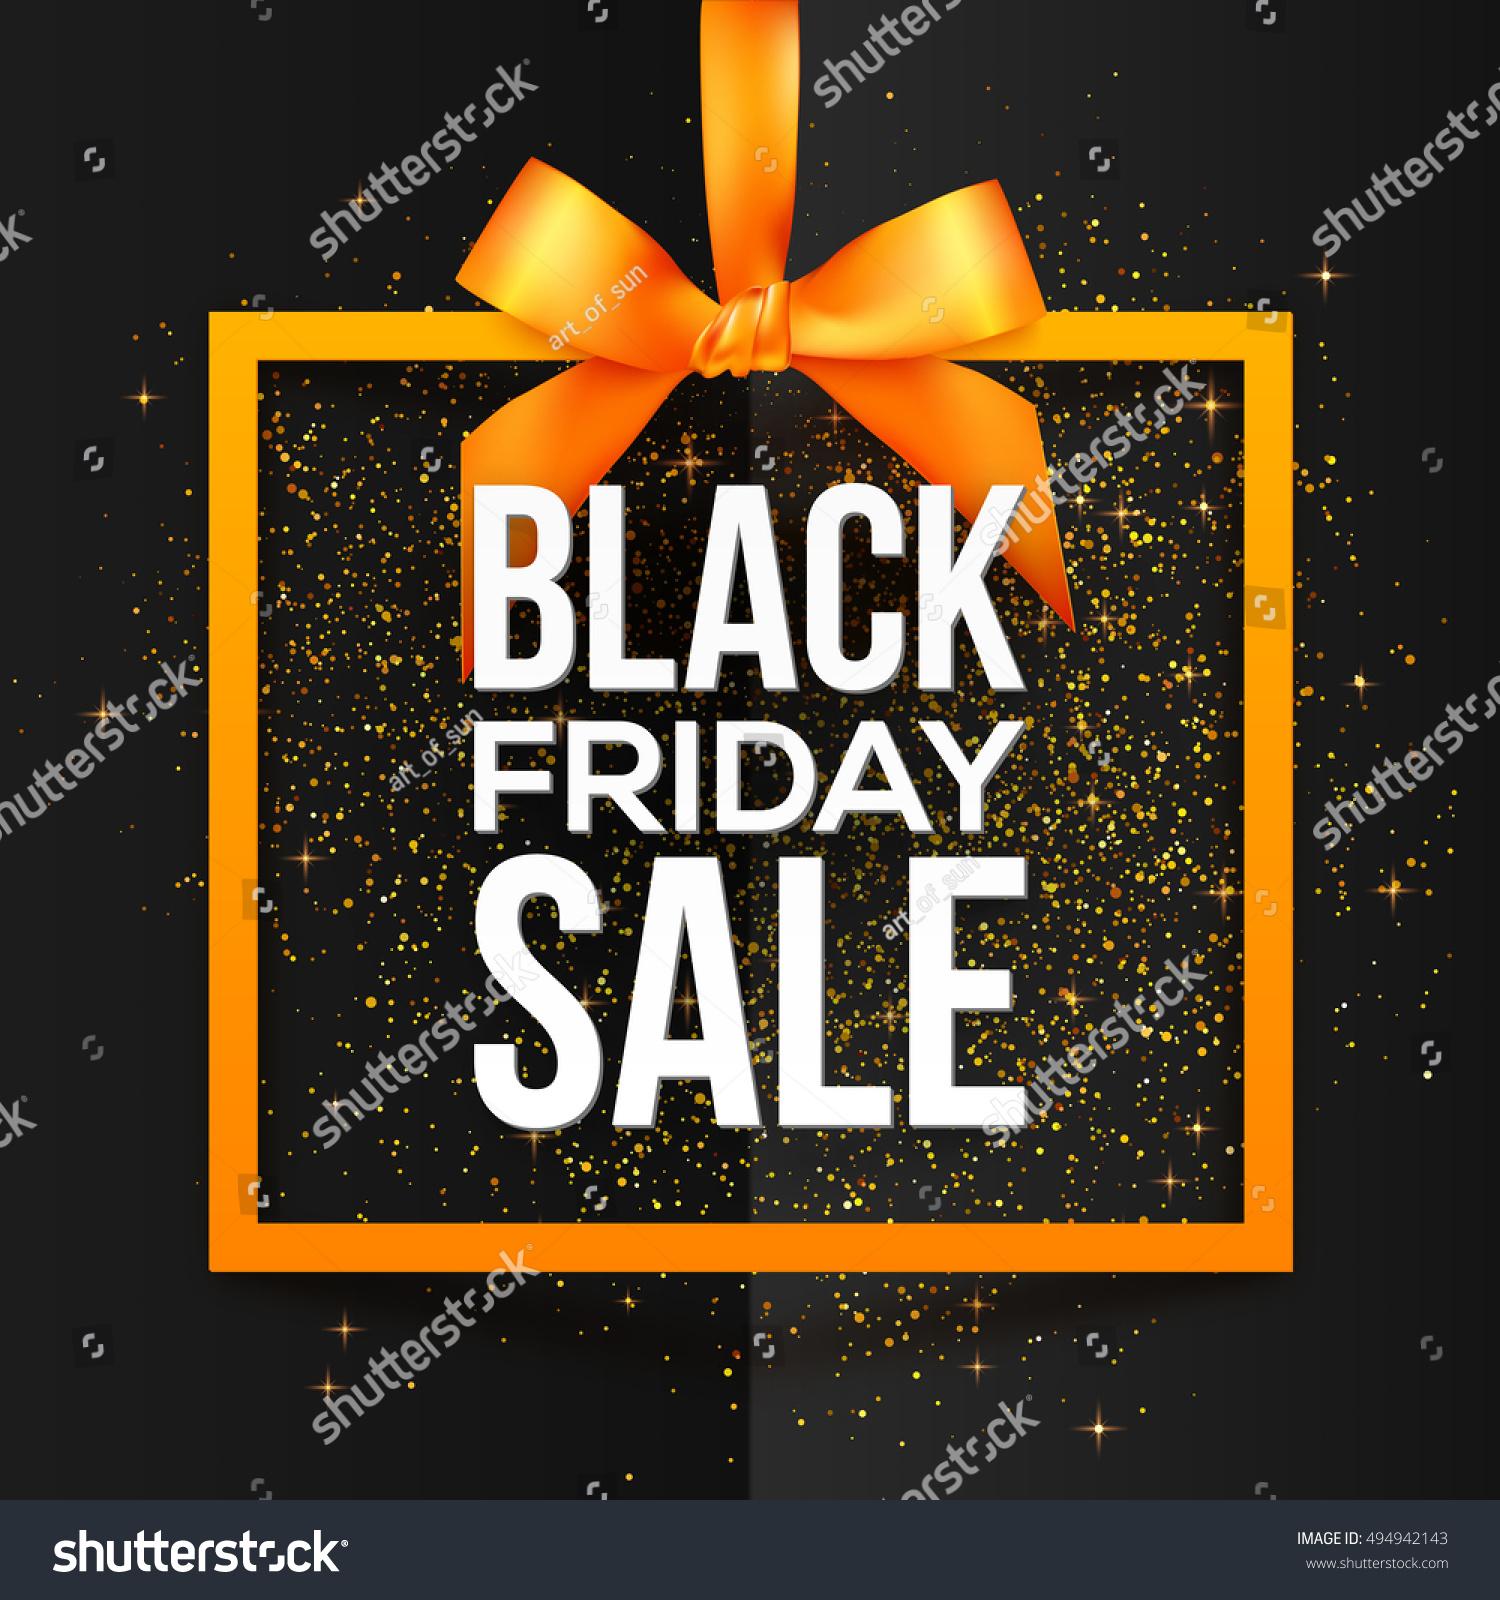 black friday sale white vector sign stock vector 494942143 shutterstock. Black Bedroom Furniture Sets. Home Design Ideas